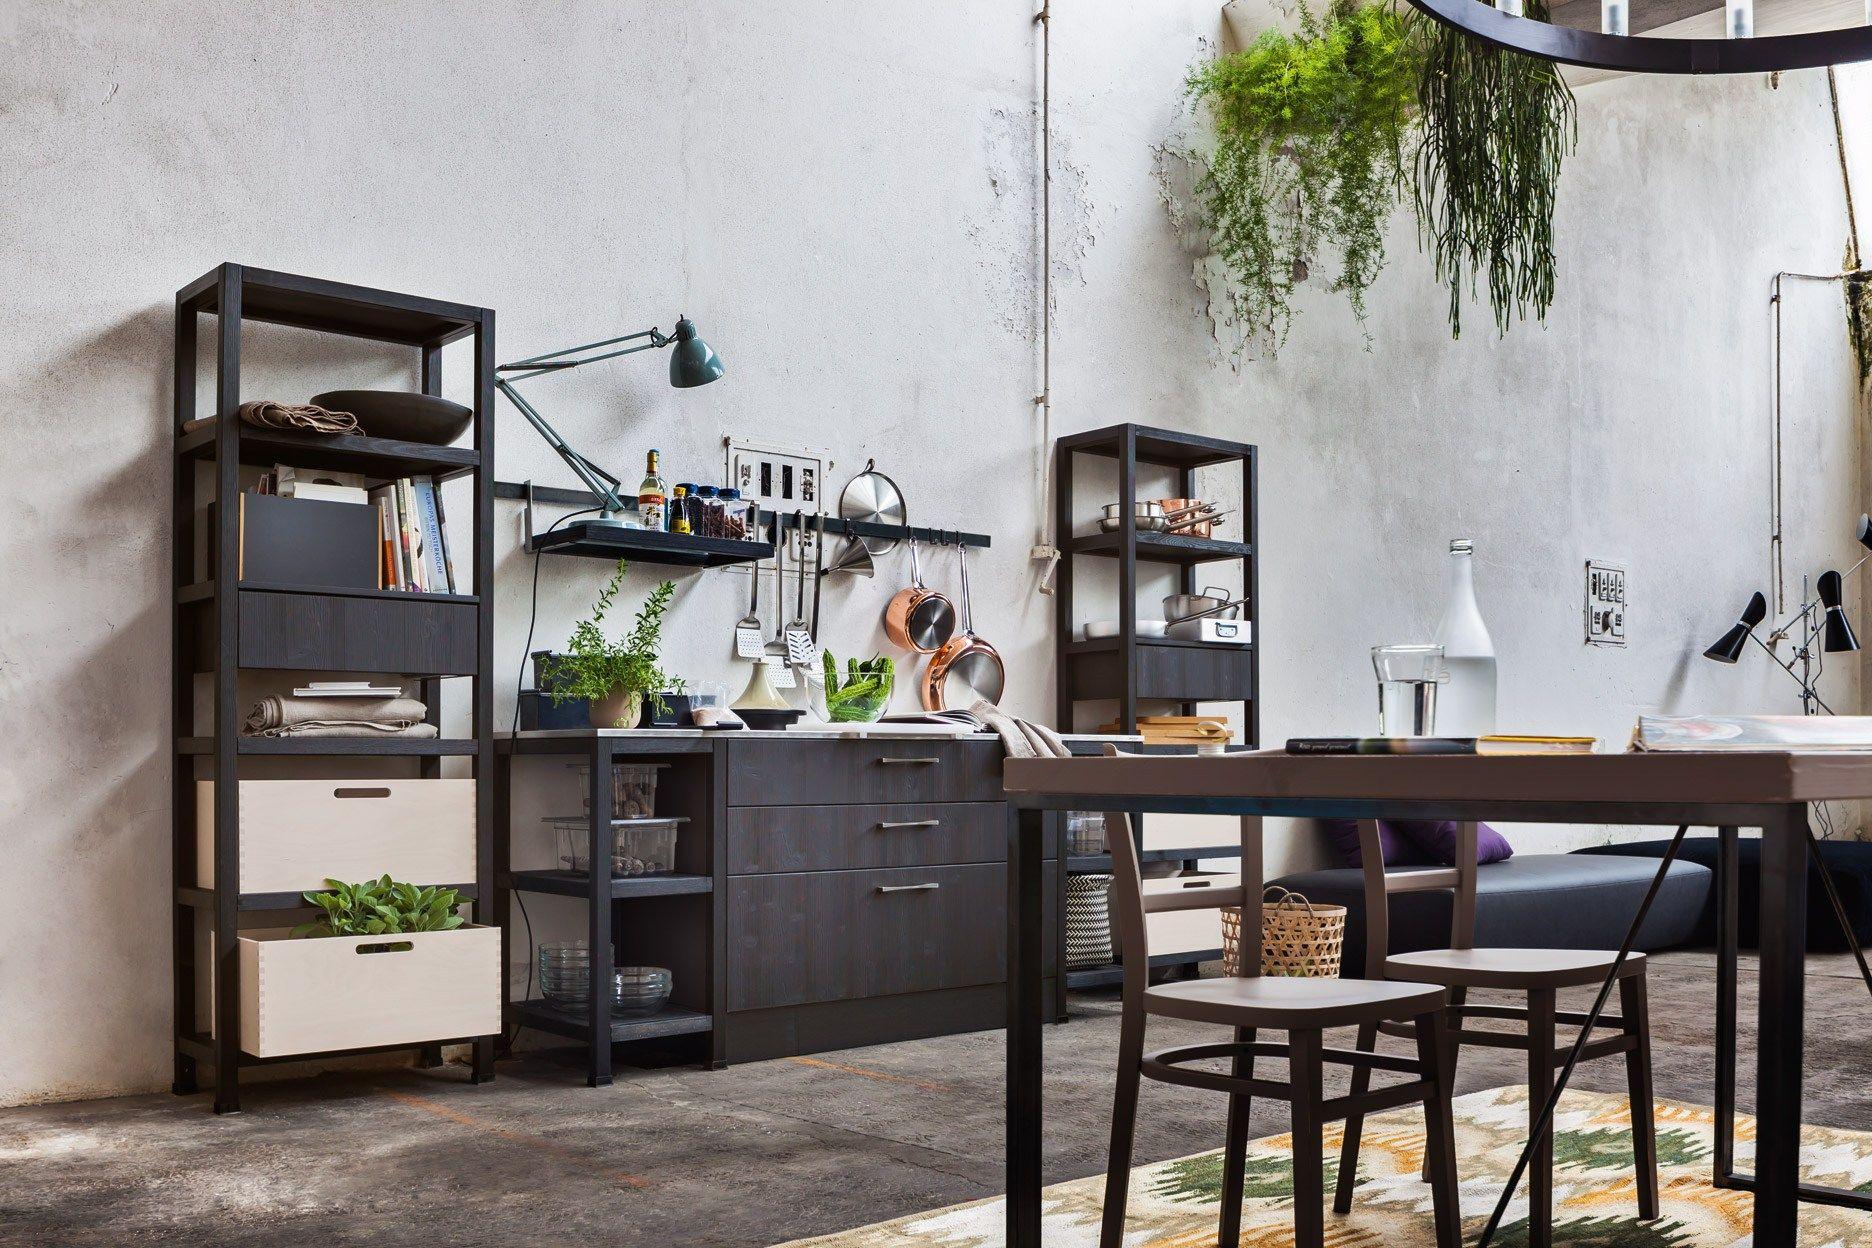 Arredamenti cucine piccole kitchen design by paolo - Arredamenti cucine piccole ...